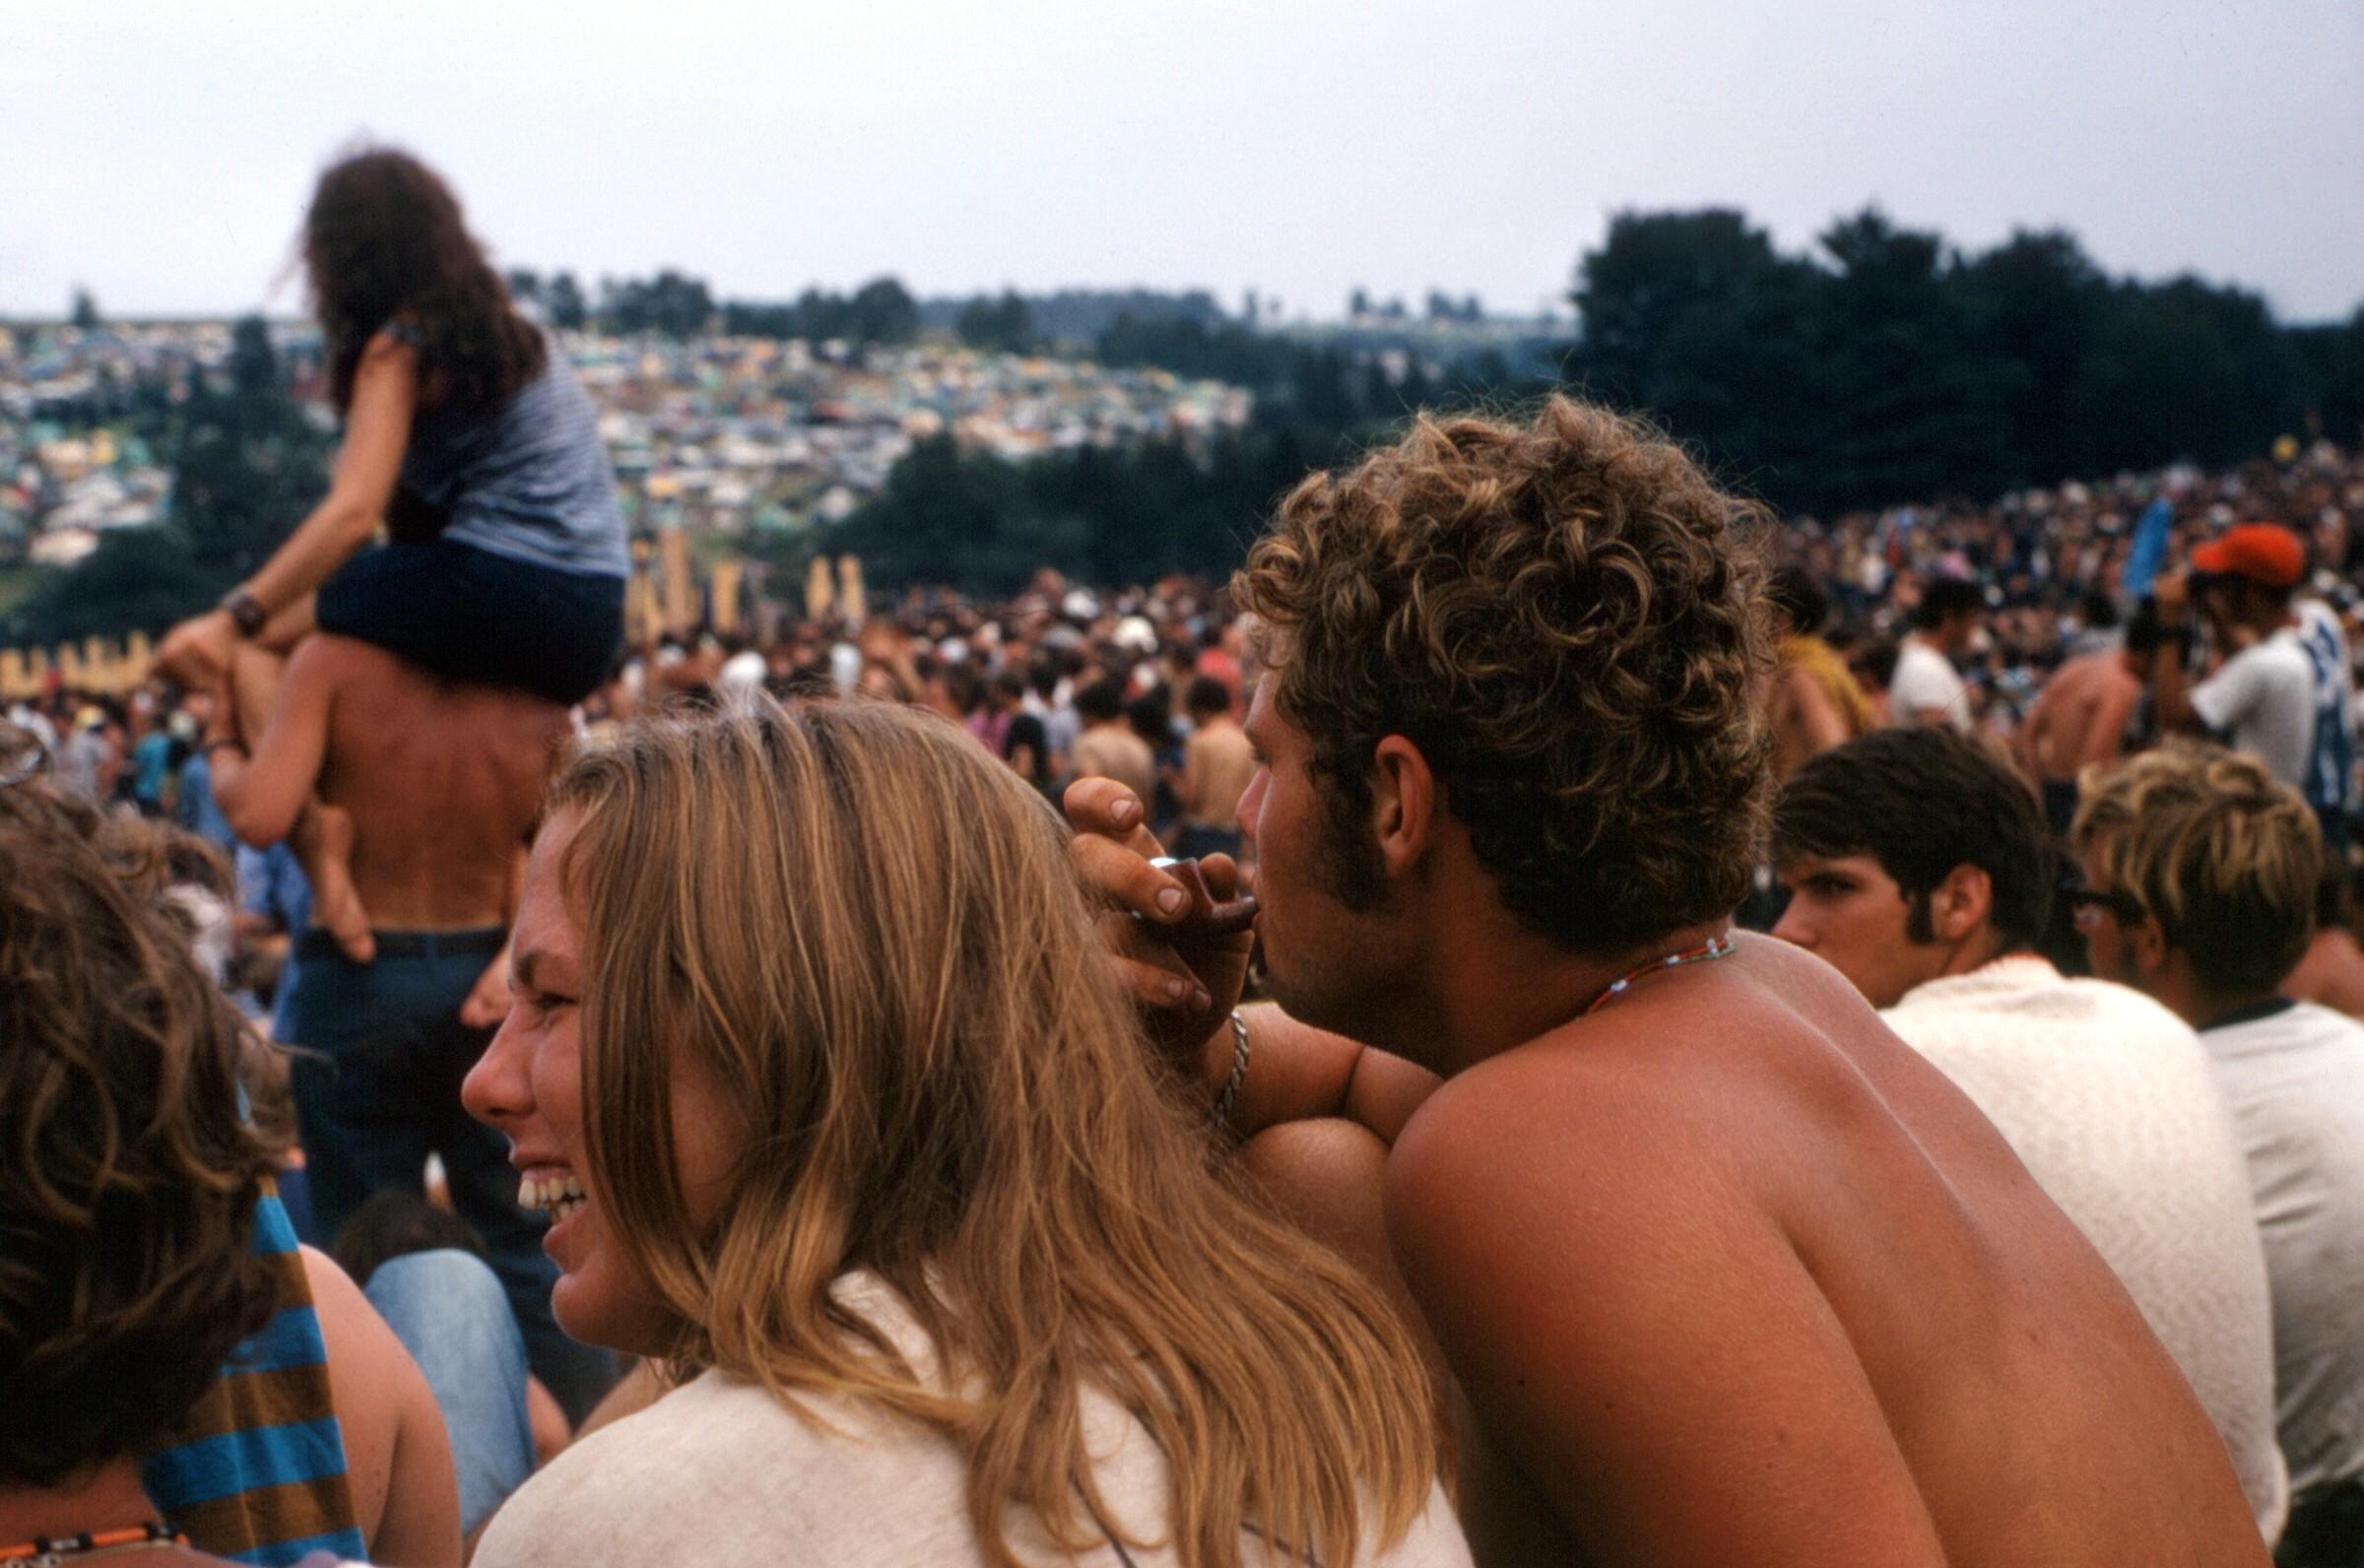 Chico chica woodstock 1969 fumando